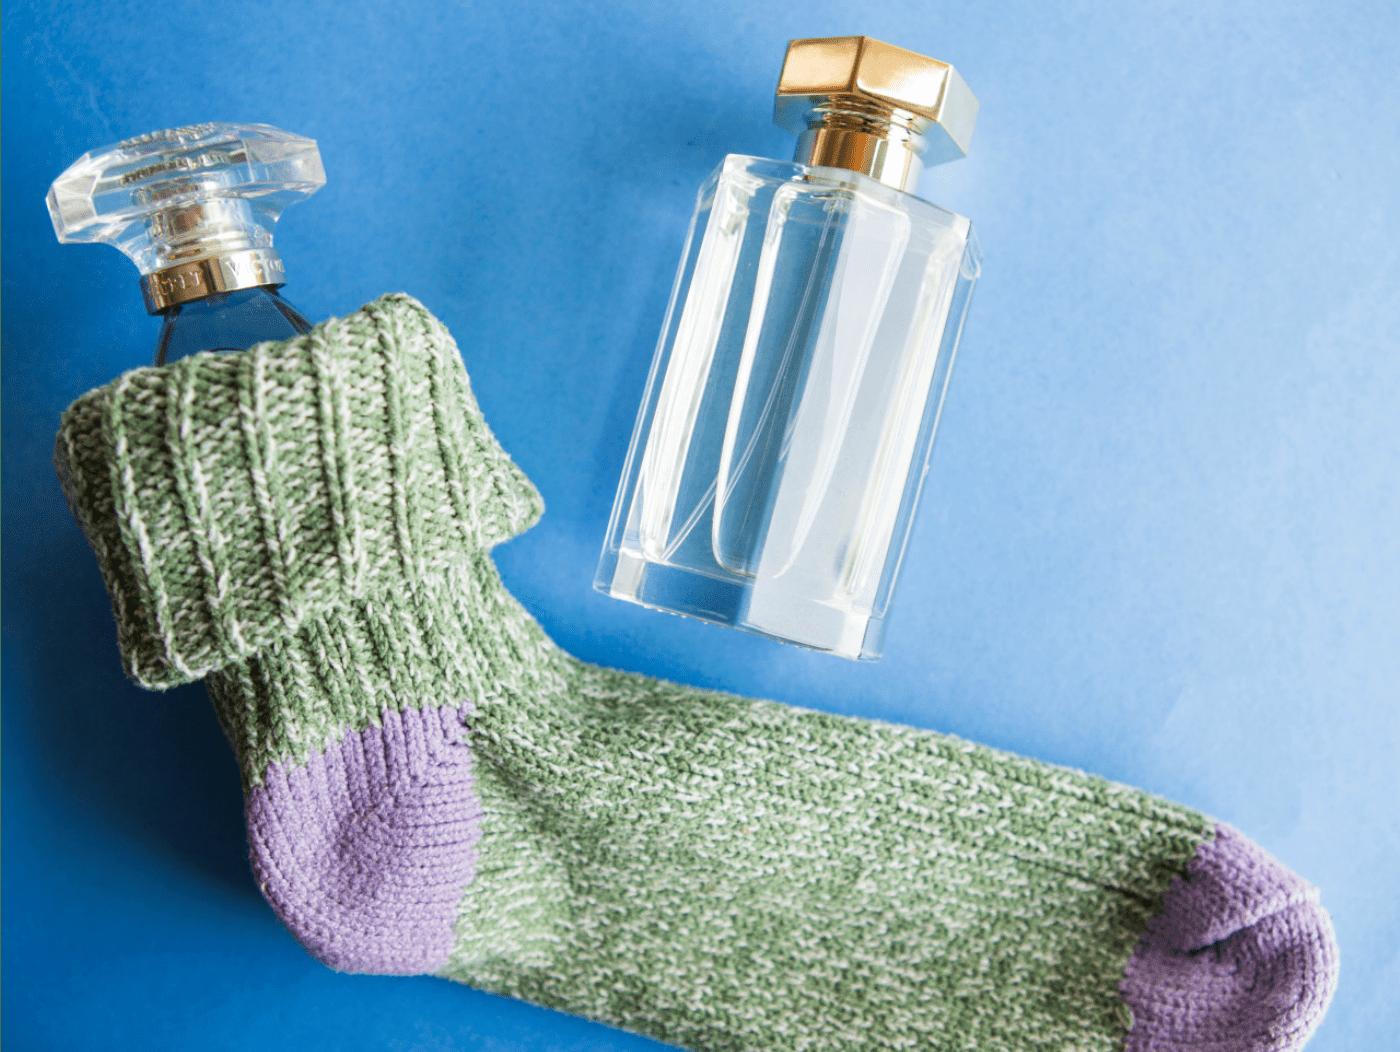 Packing Tips: Protect Fragrance Bottles